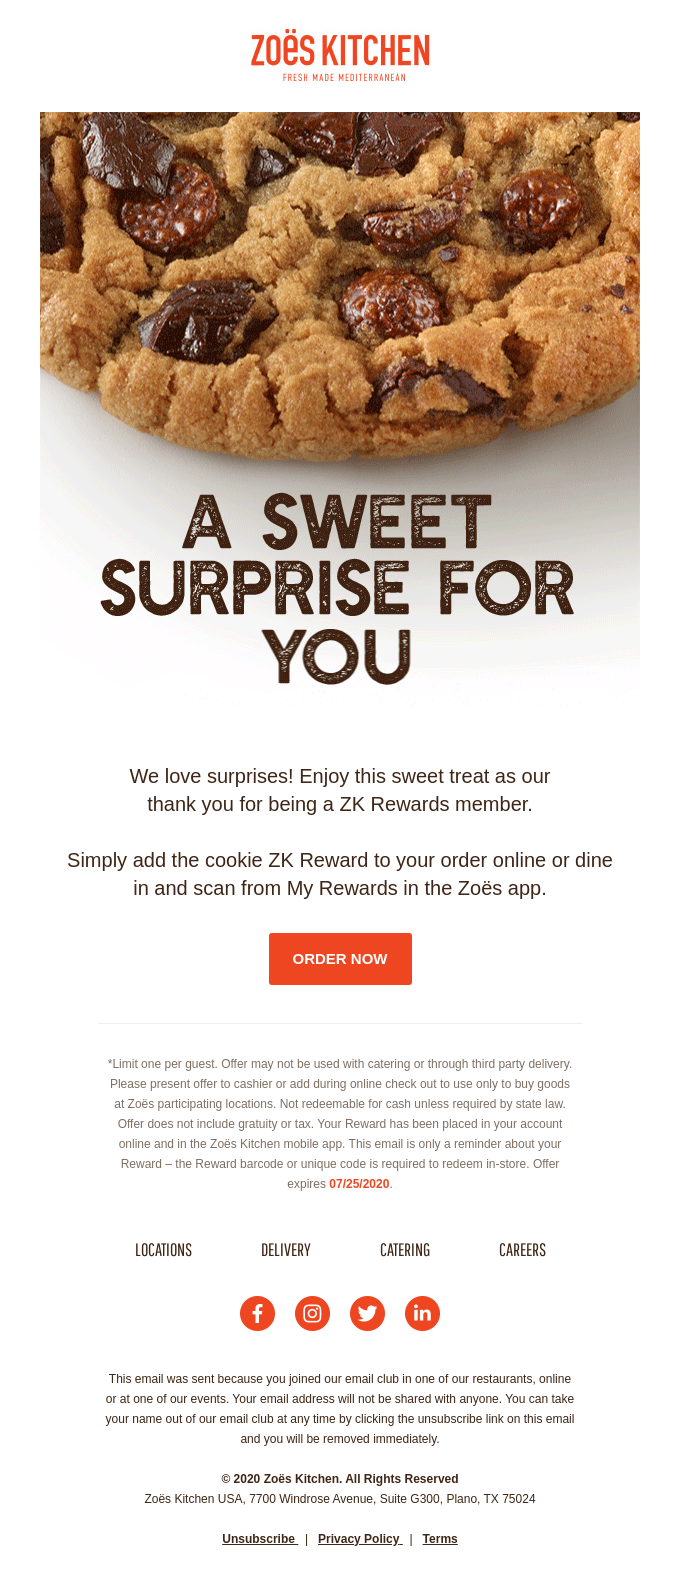 ✨ Surprise! A Special ZK Reward For You